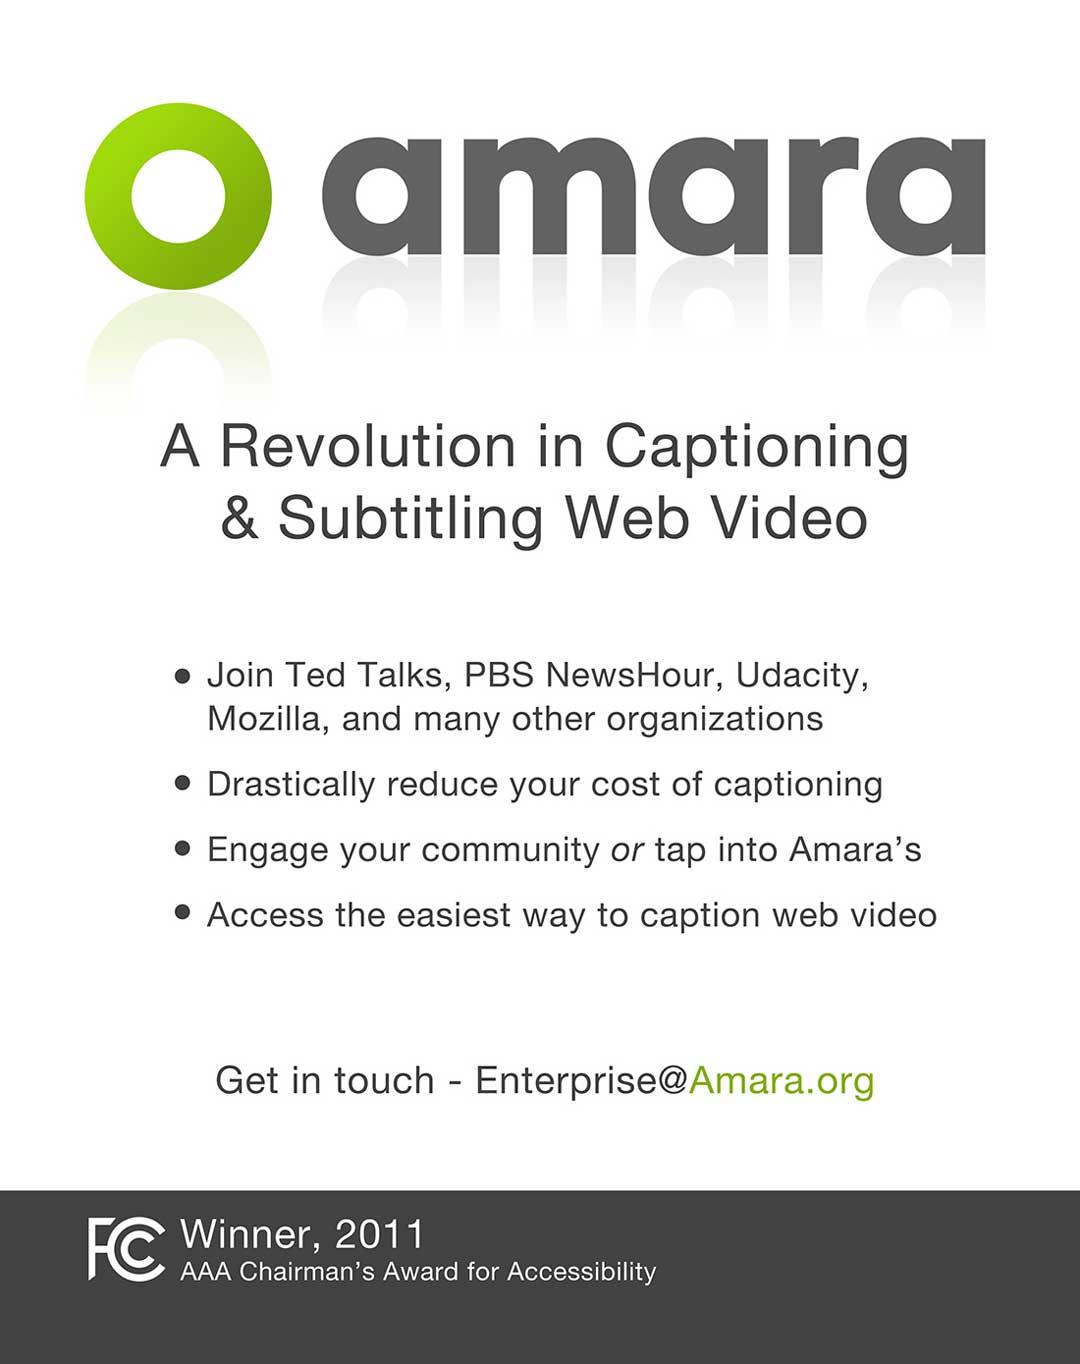 amara - A revolution in subtitling